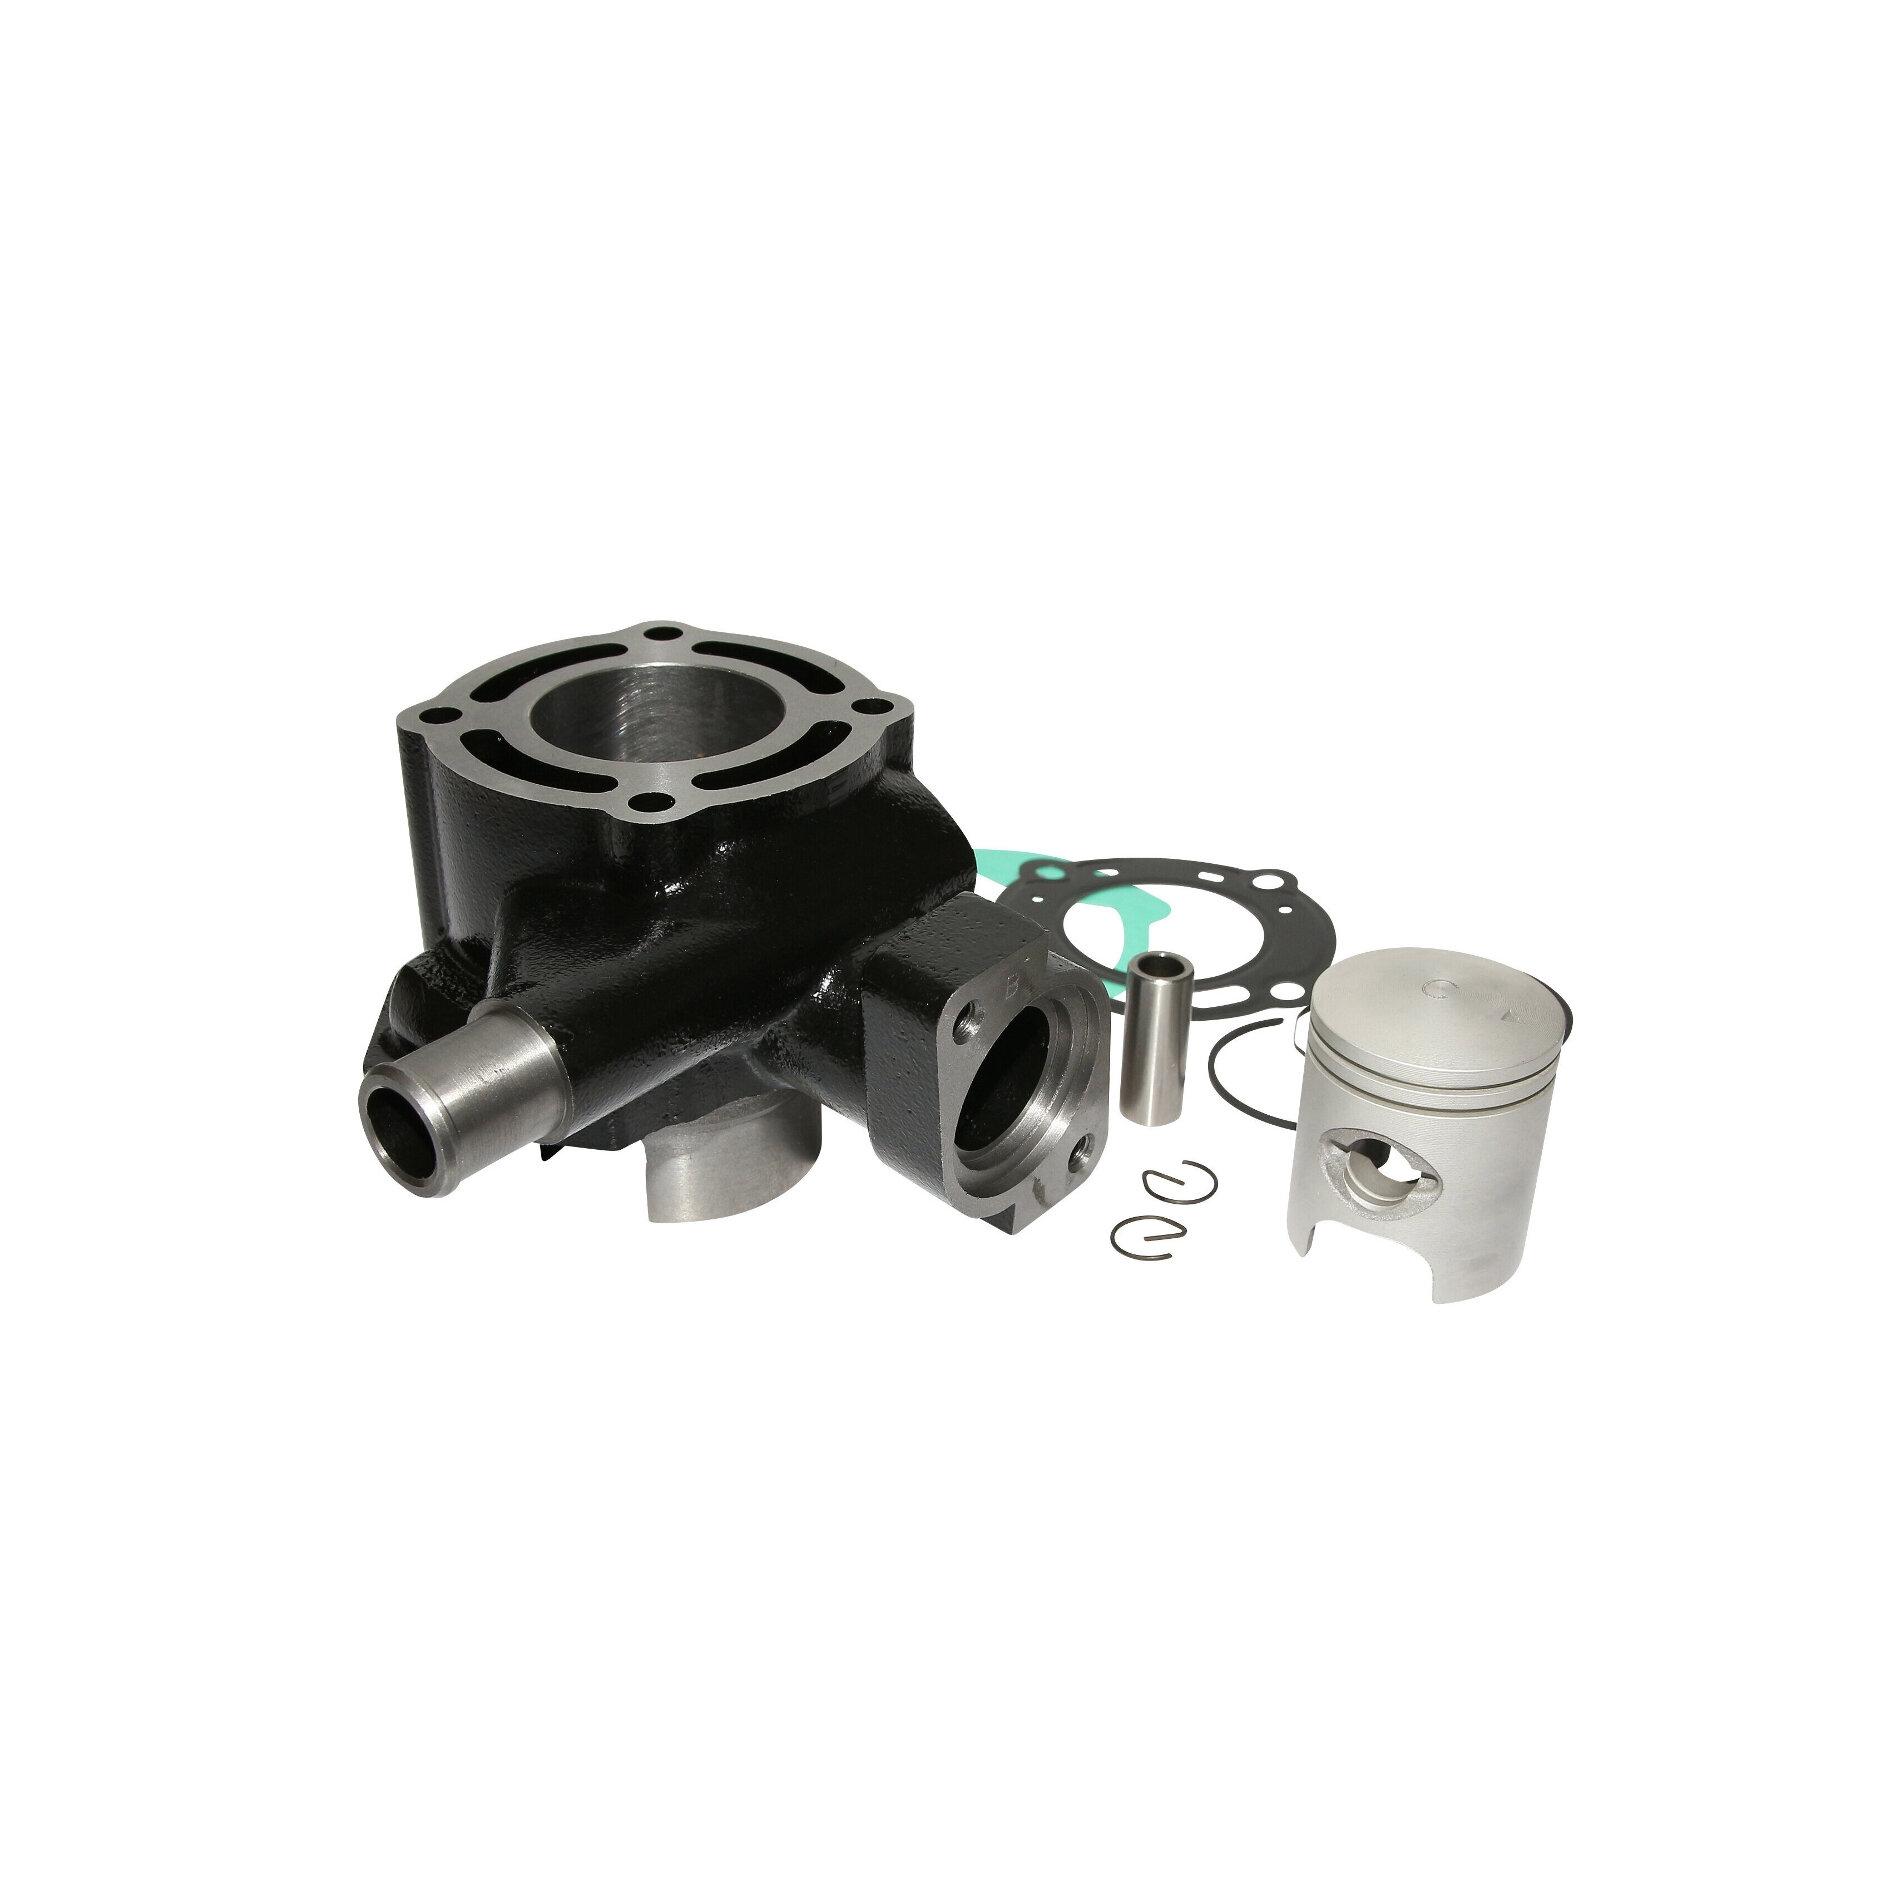 Cylindre fonte Peugeot Speedfight 3 / 4 Liquide